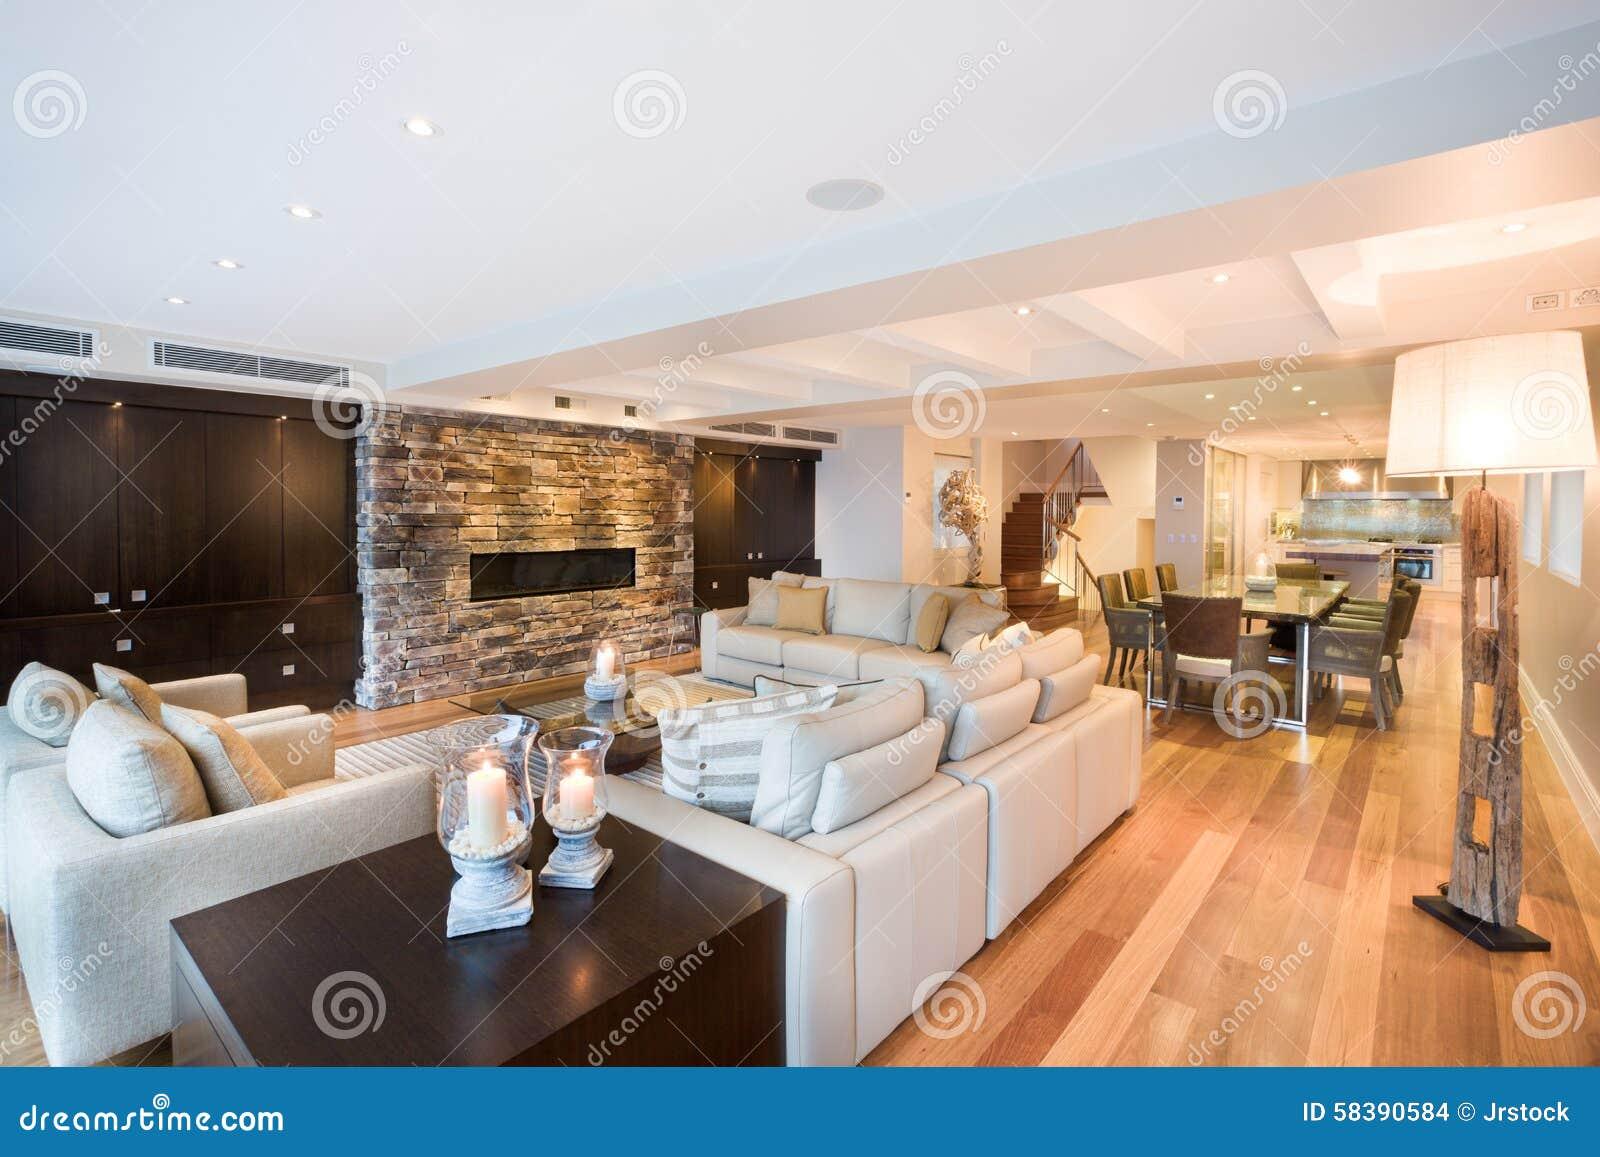 Woonkamer Houten Vloer : Nieuwe moderne woonkamer met keuken nieuw huis